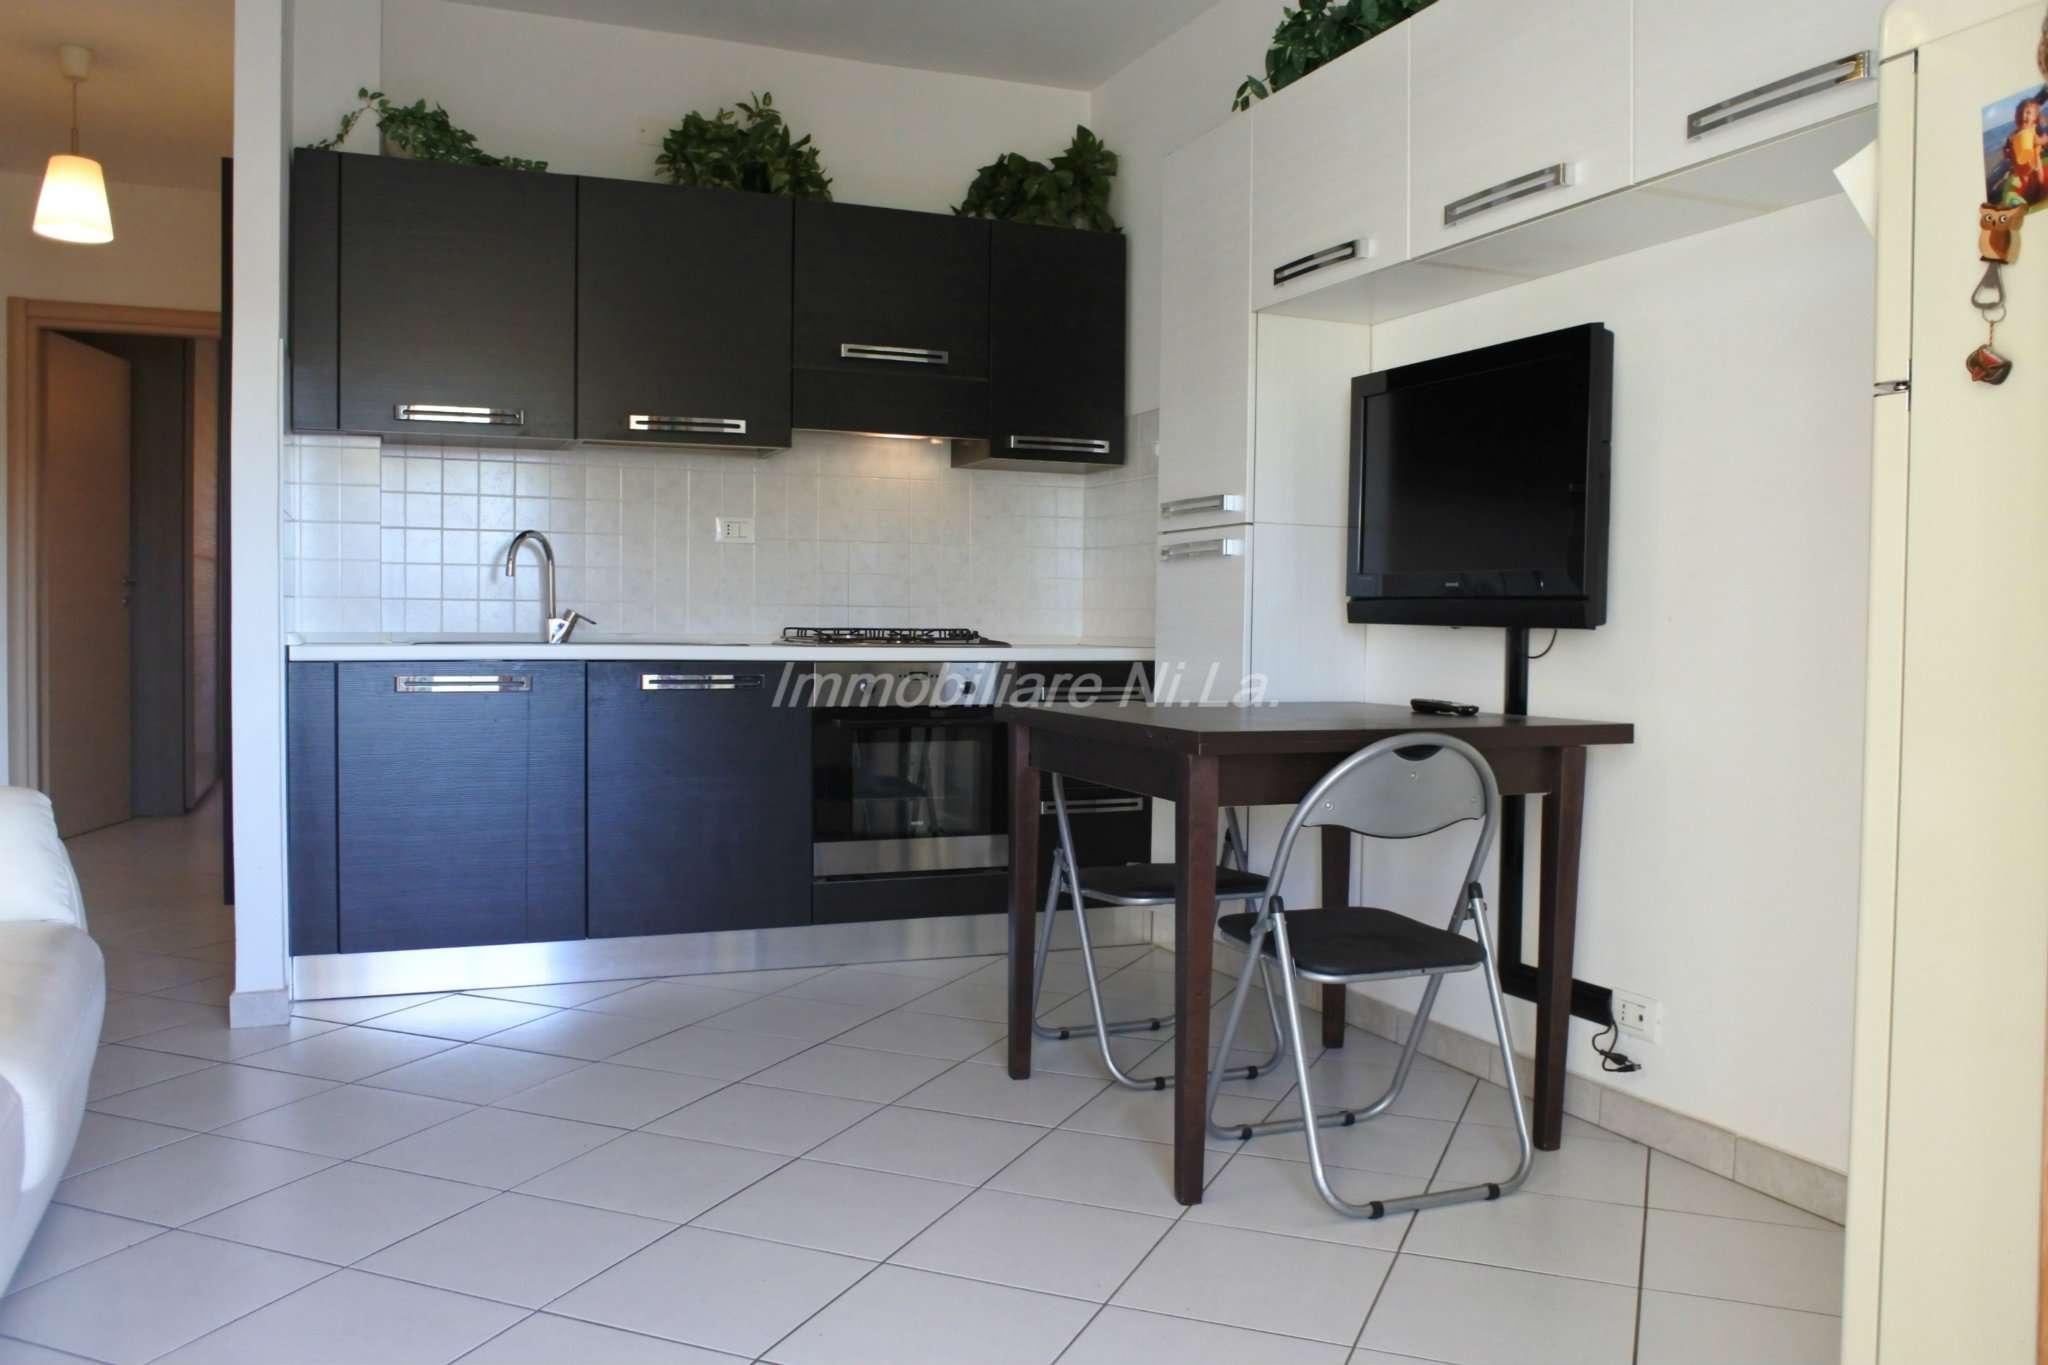 Appartamento bilocale in vendita a Pisa (PI)